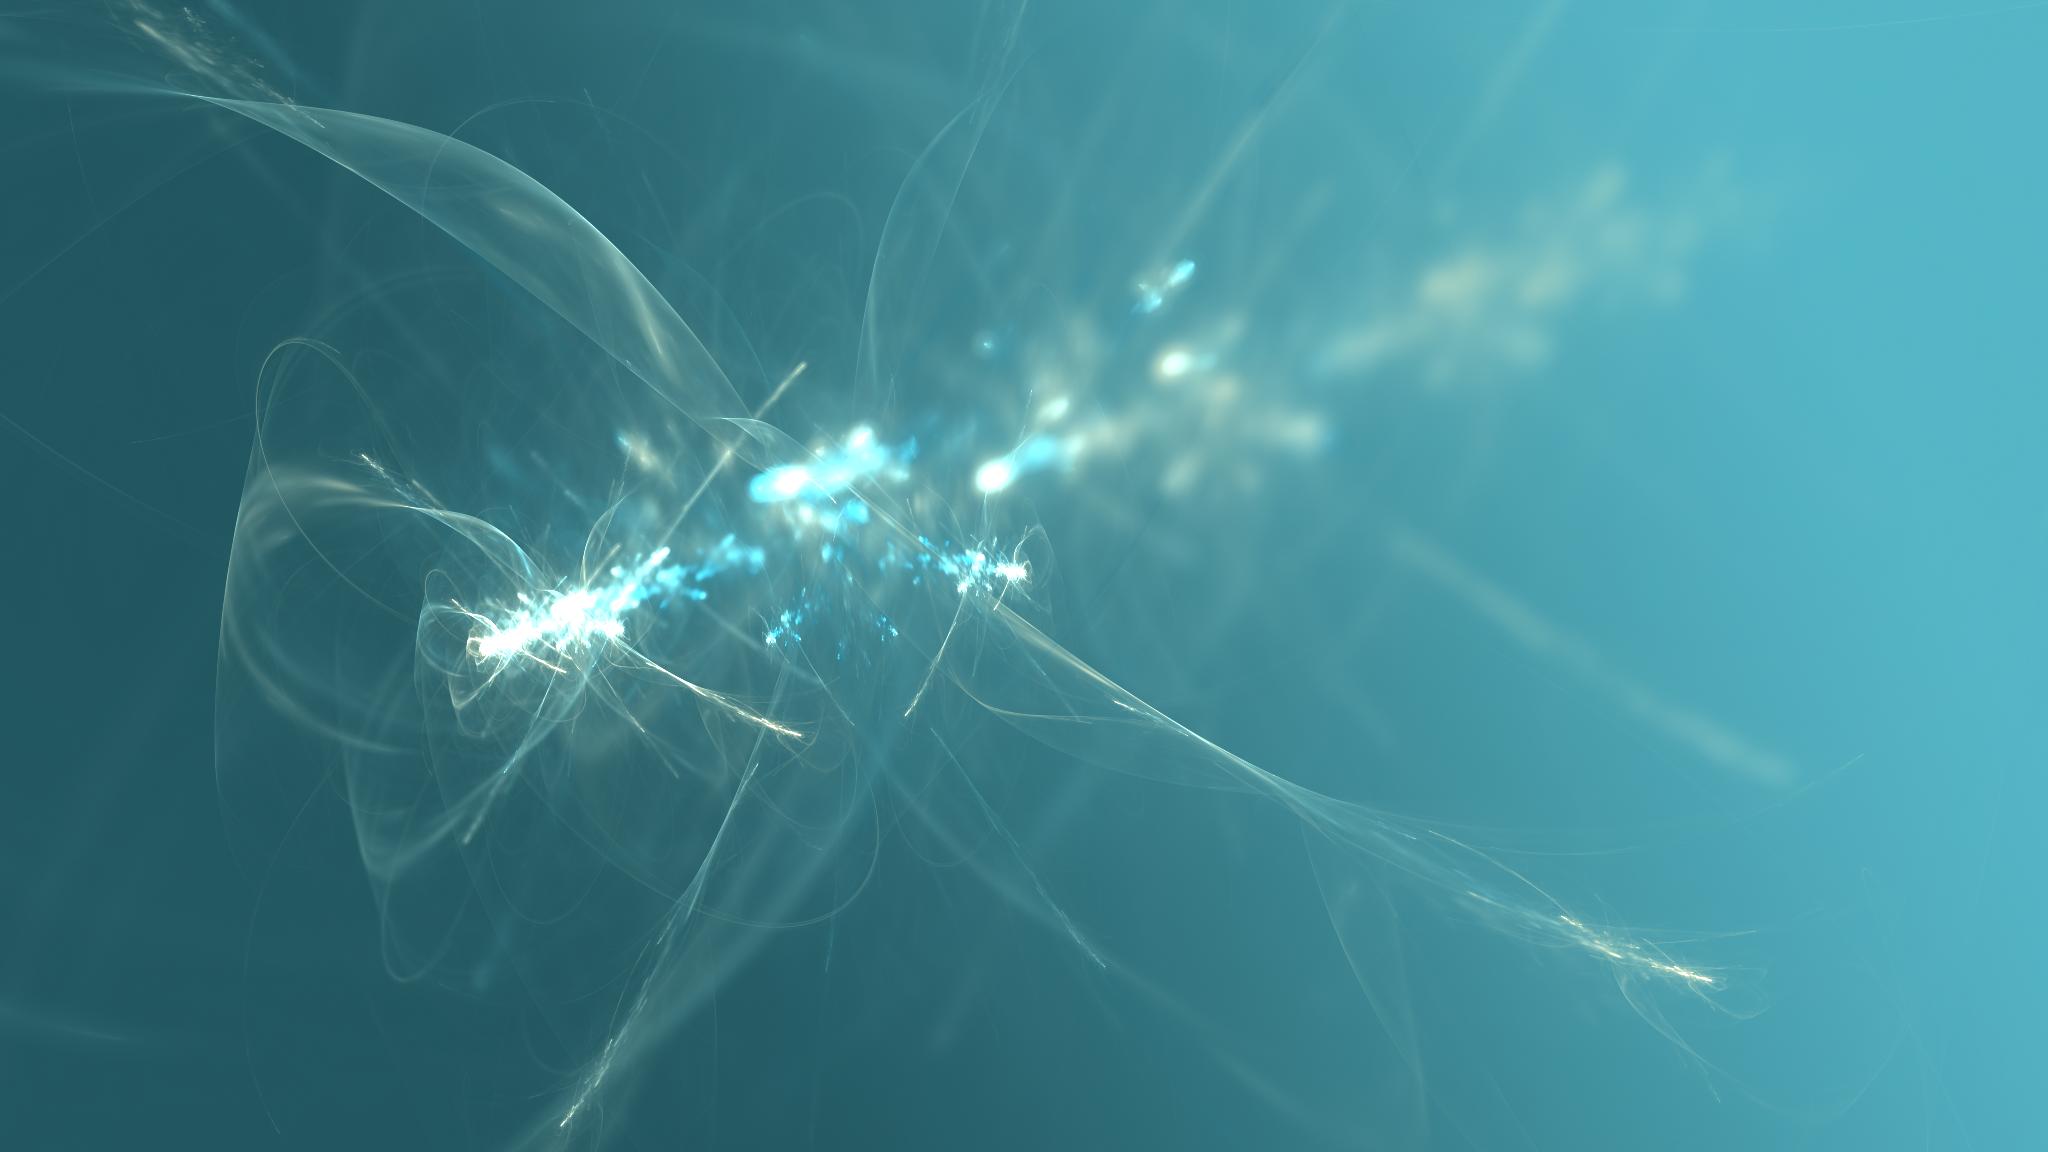 artwork blue fractal digital art abstract shapes